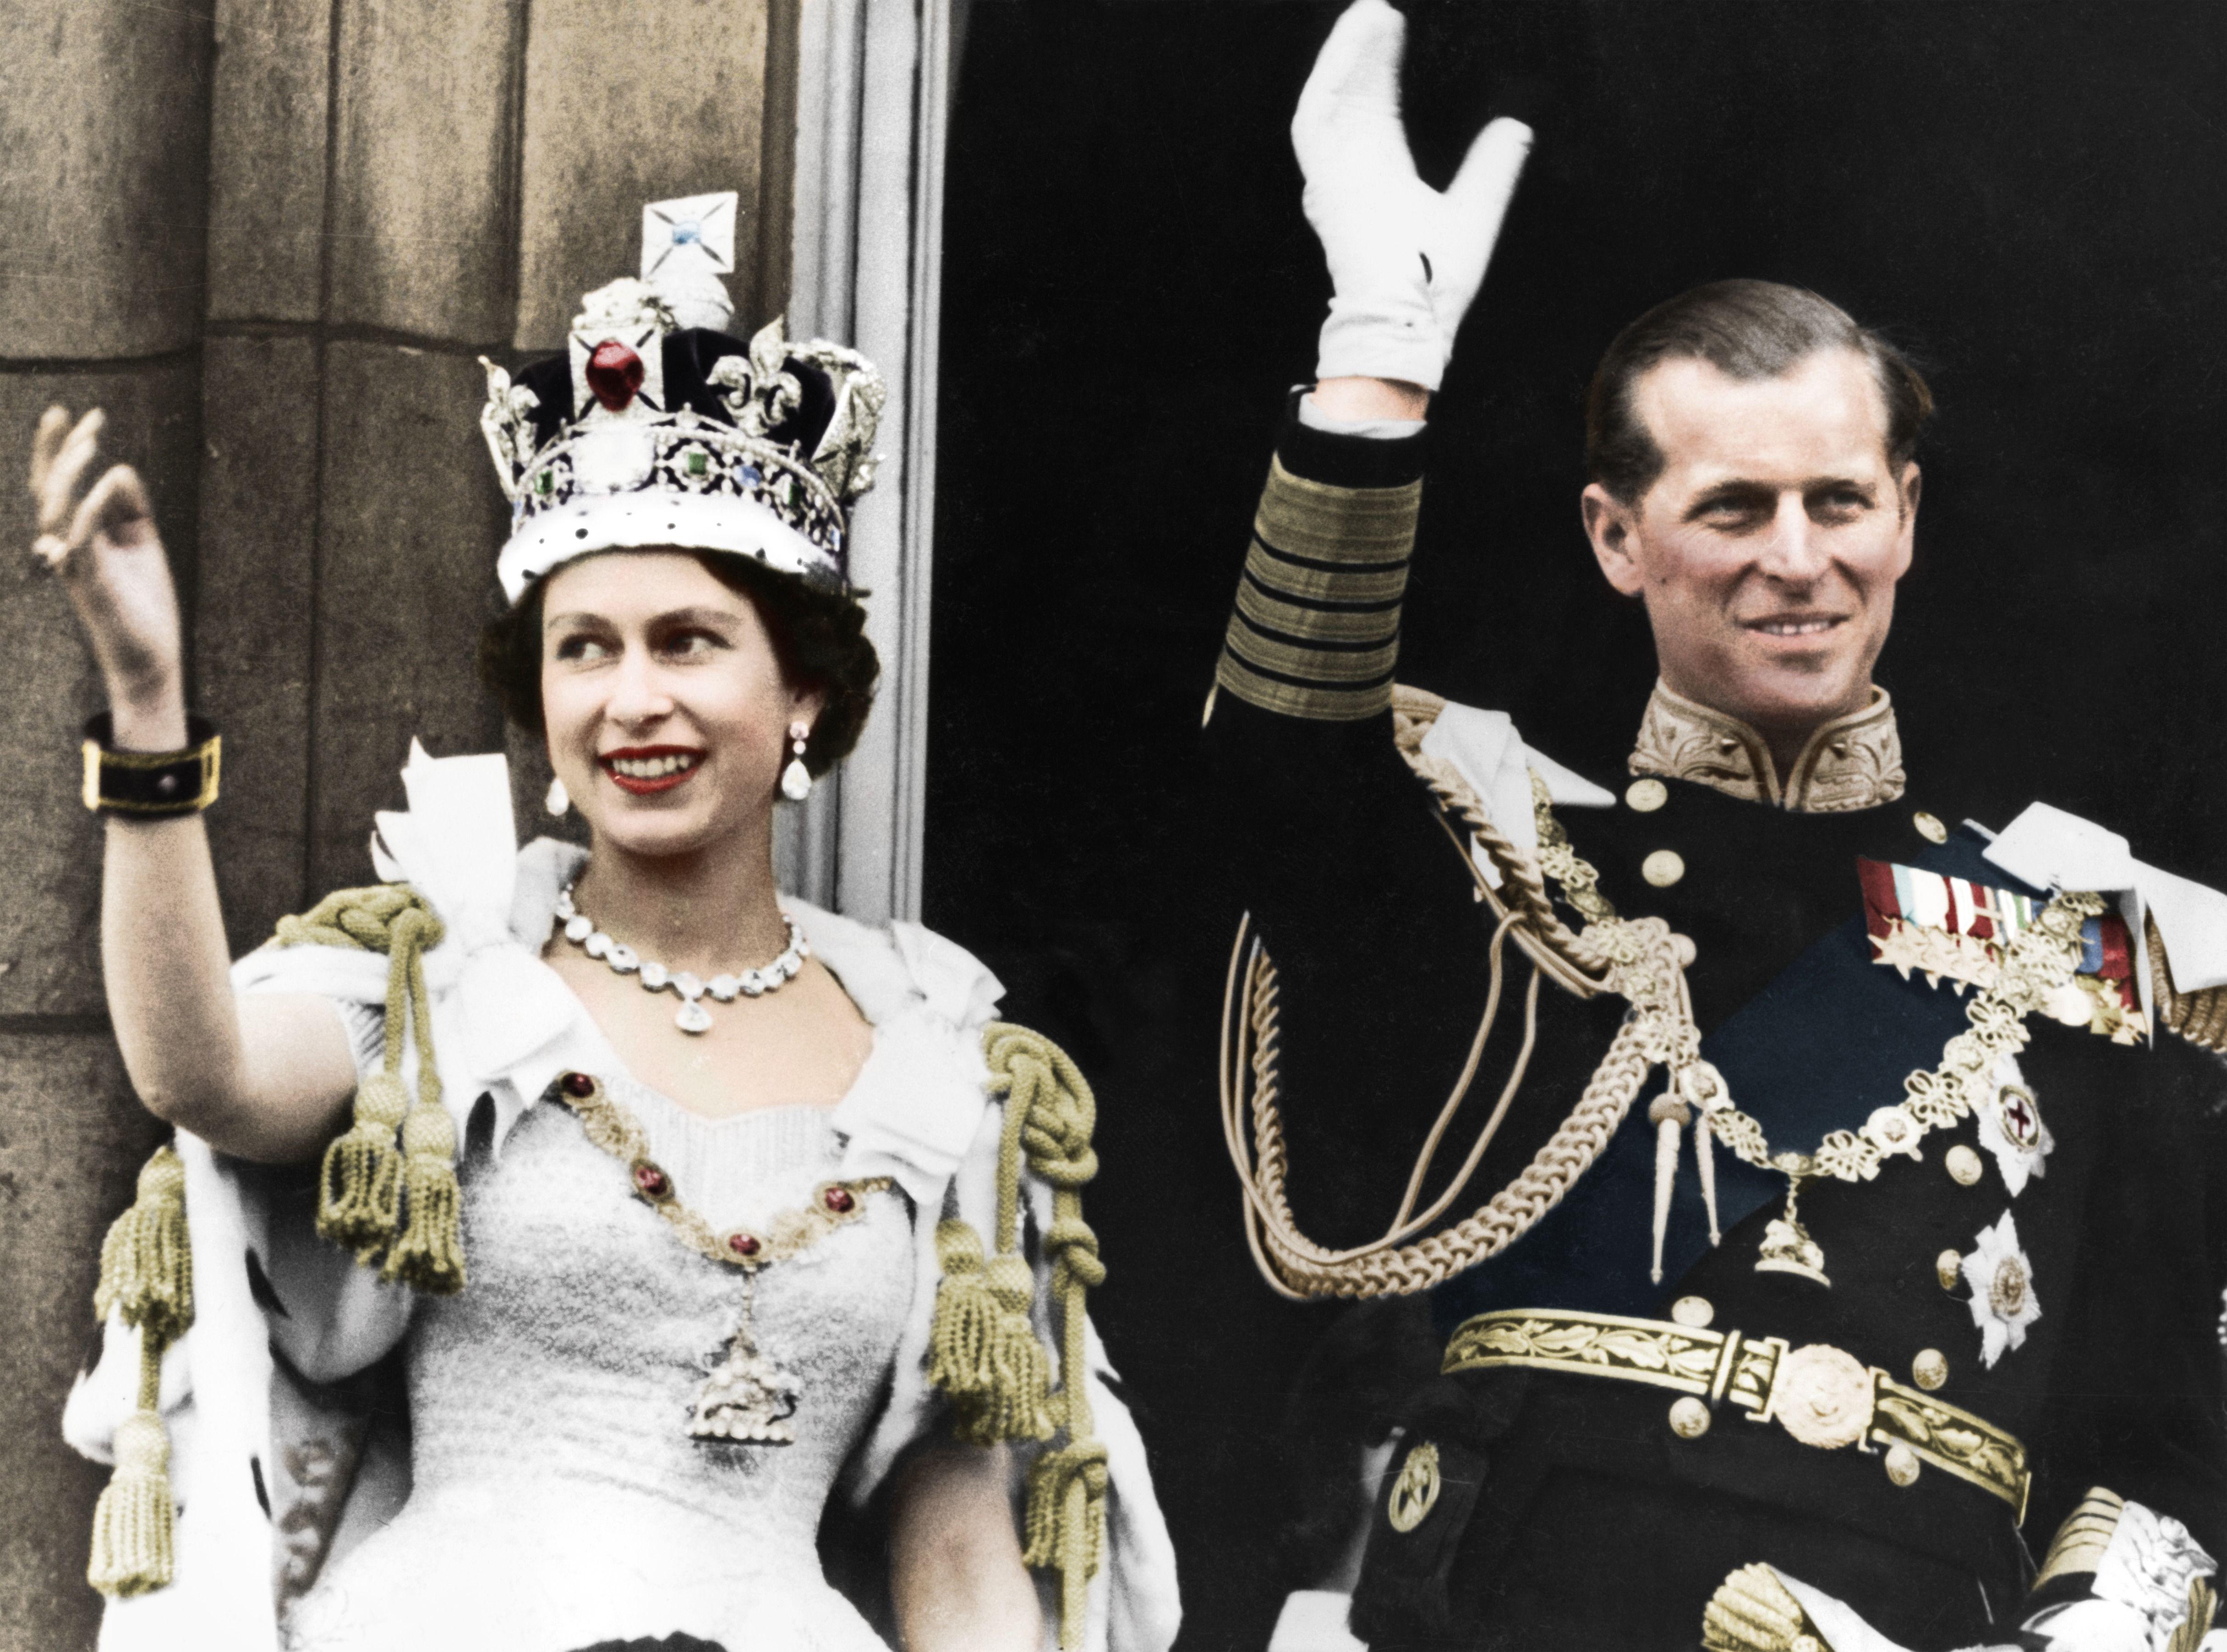 25 Best Royal Tiara Photos Of All Time Royal Family Tiaras